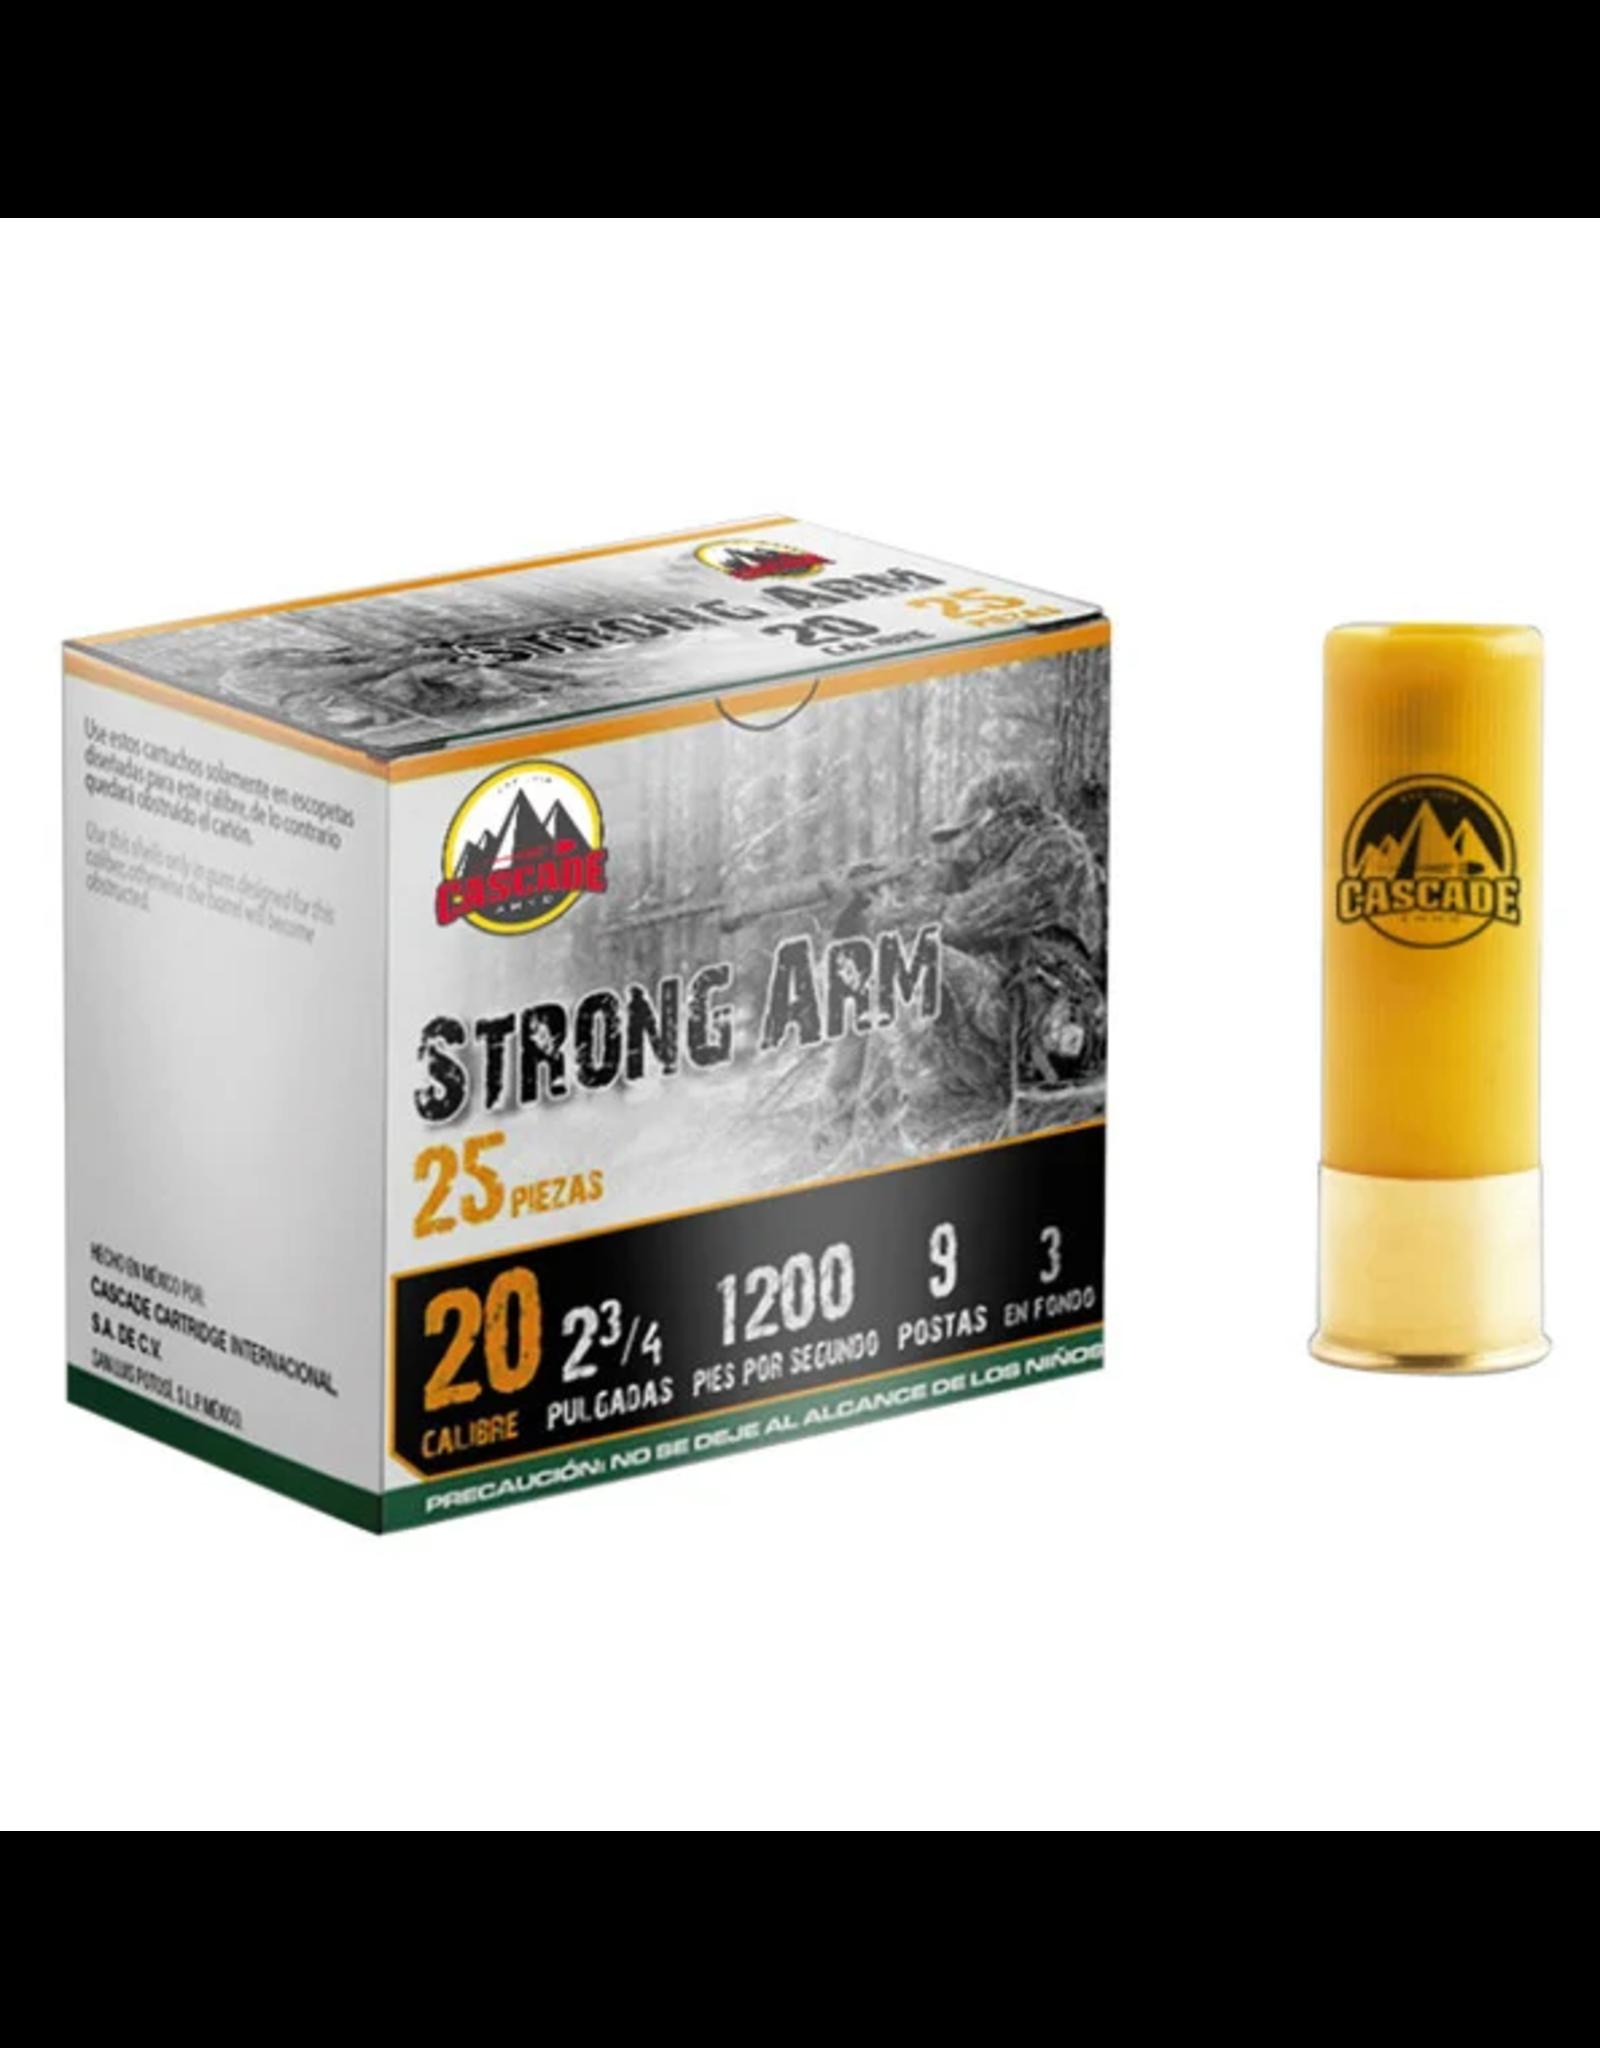 "Cascade Ammo Cascade - 20ga 2-3/4"" Buck Strong Arm - #2B-9 - 25ct"